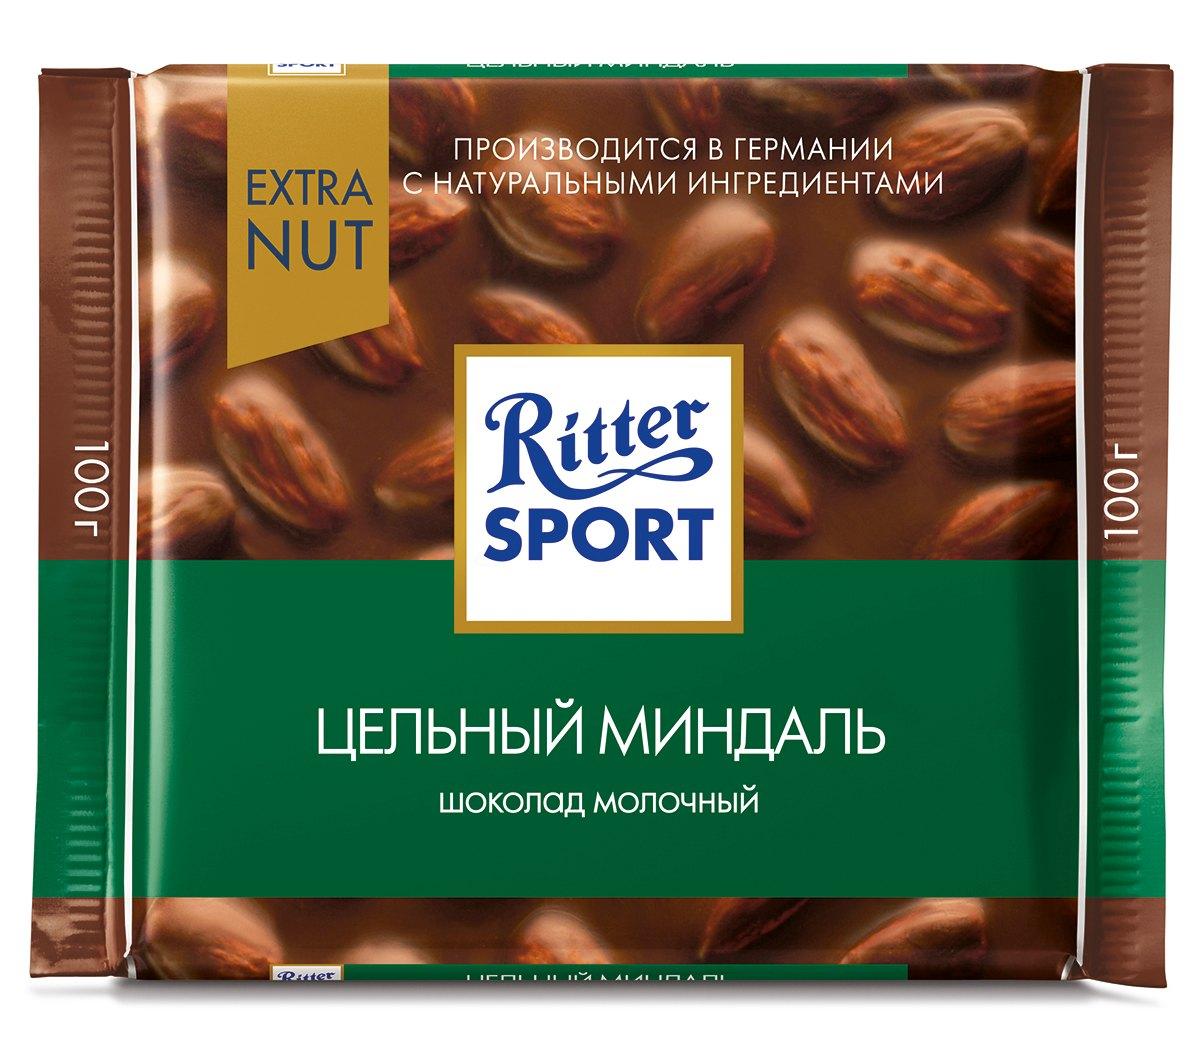 Шоколад молочный с цельным миндалем Extra Ritter Sport